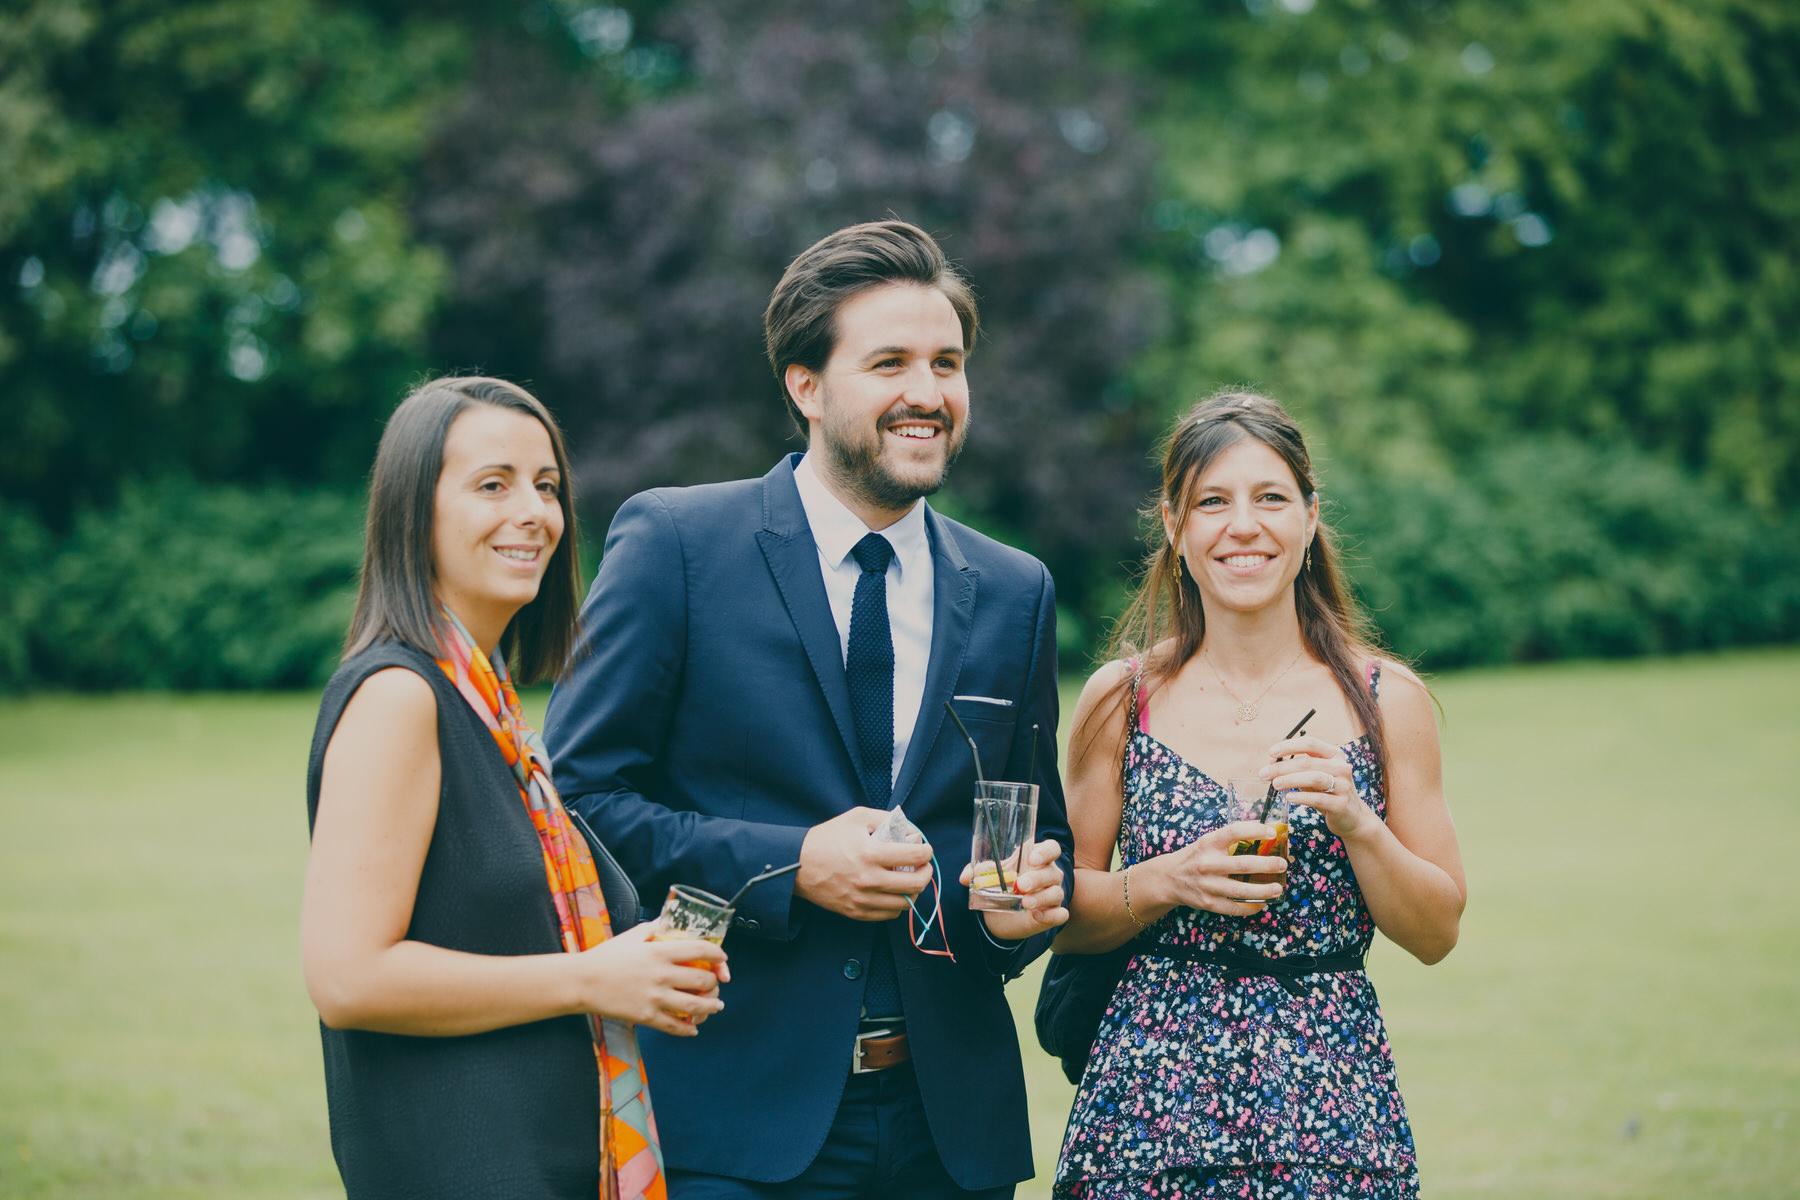 241 Surrey wedding reception drinks guest candid reportage.jpg